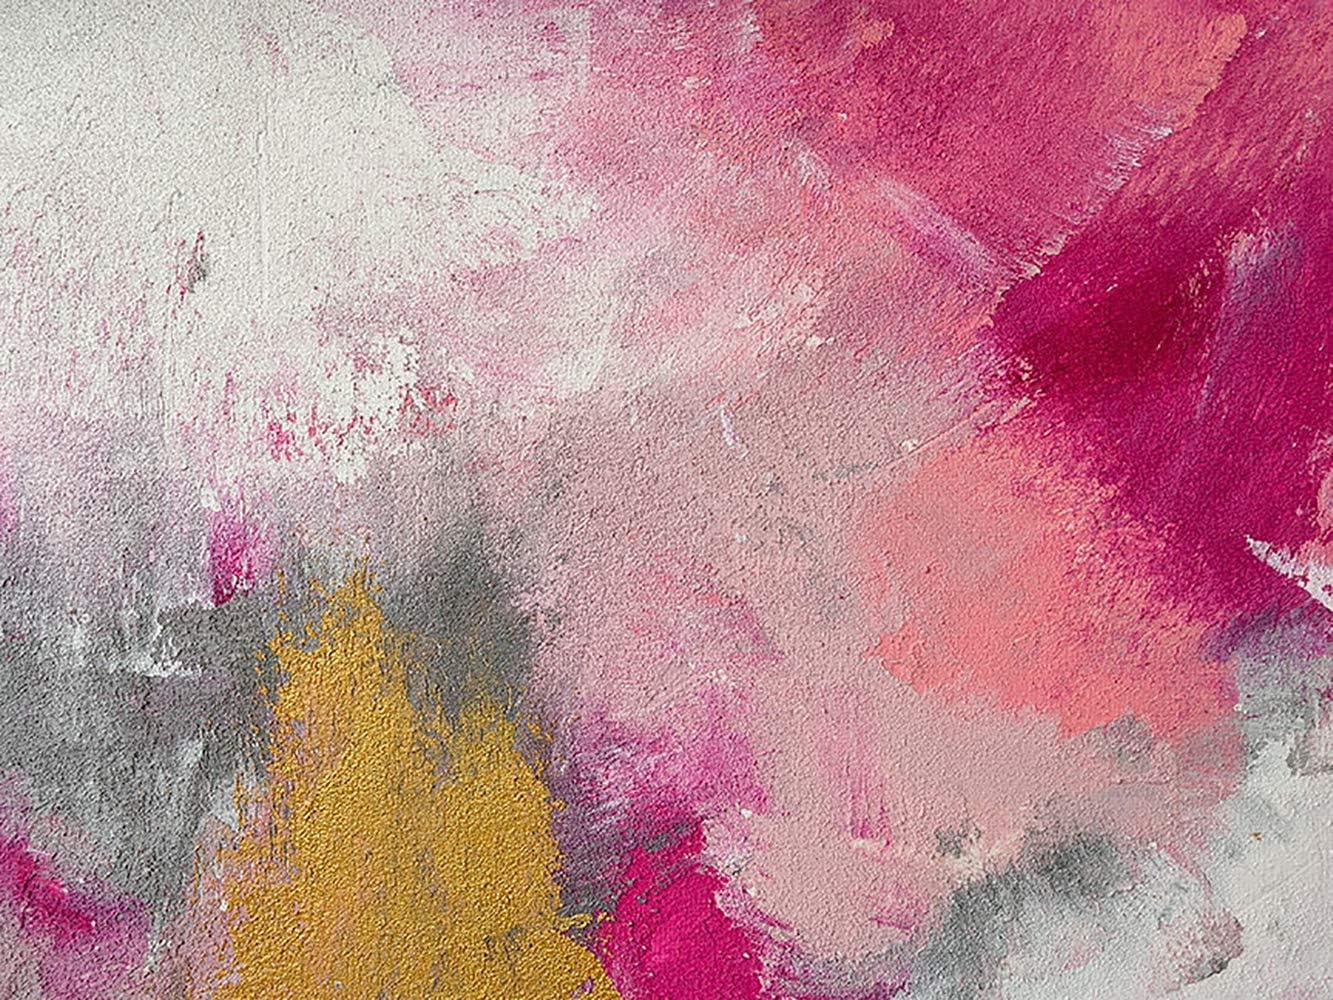 Popularity Buyartforless CAN GG012 12x16 GW Wall Free Shipping New Canvas Pink Art